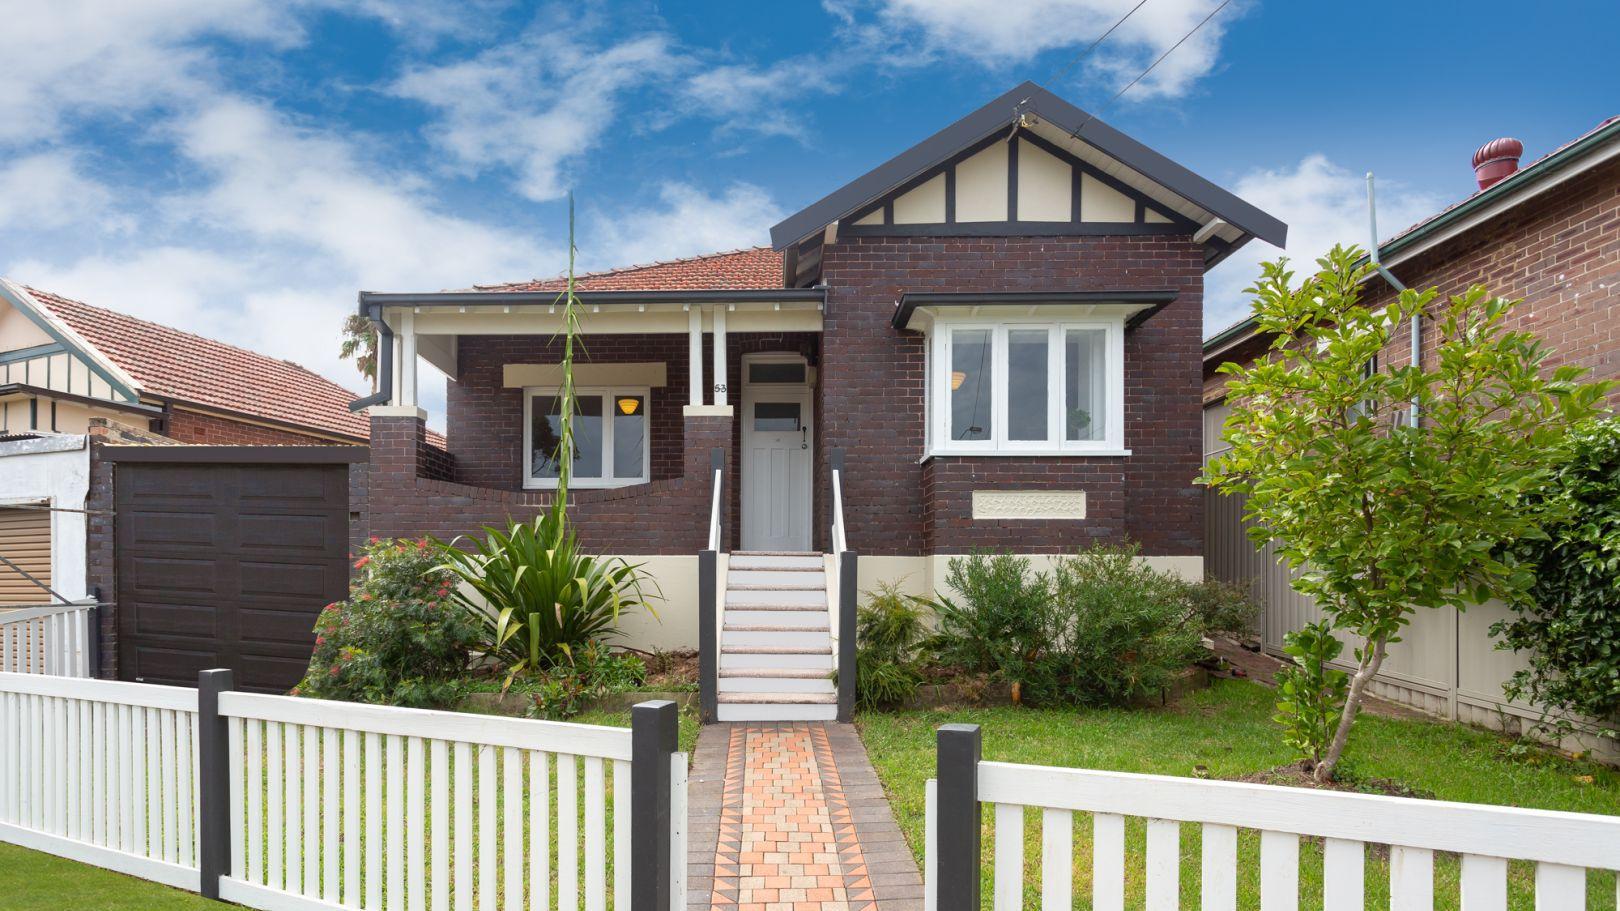 Australia's house prices edge marginally higher as property listings plummet – 9News